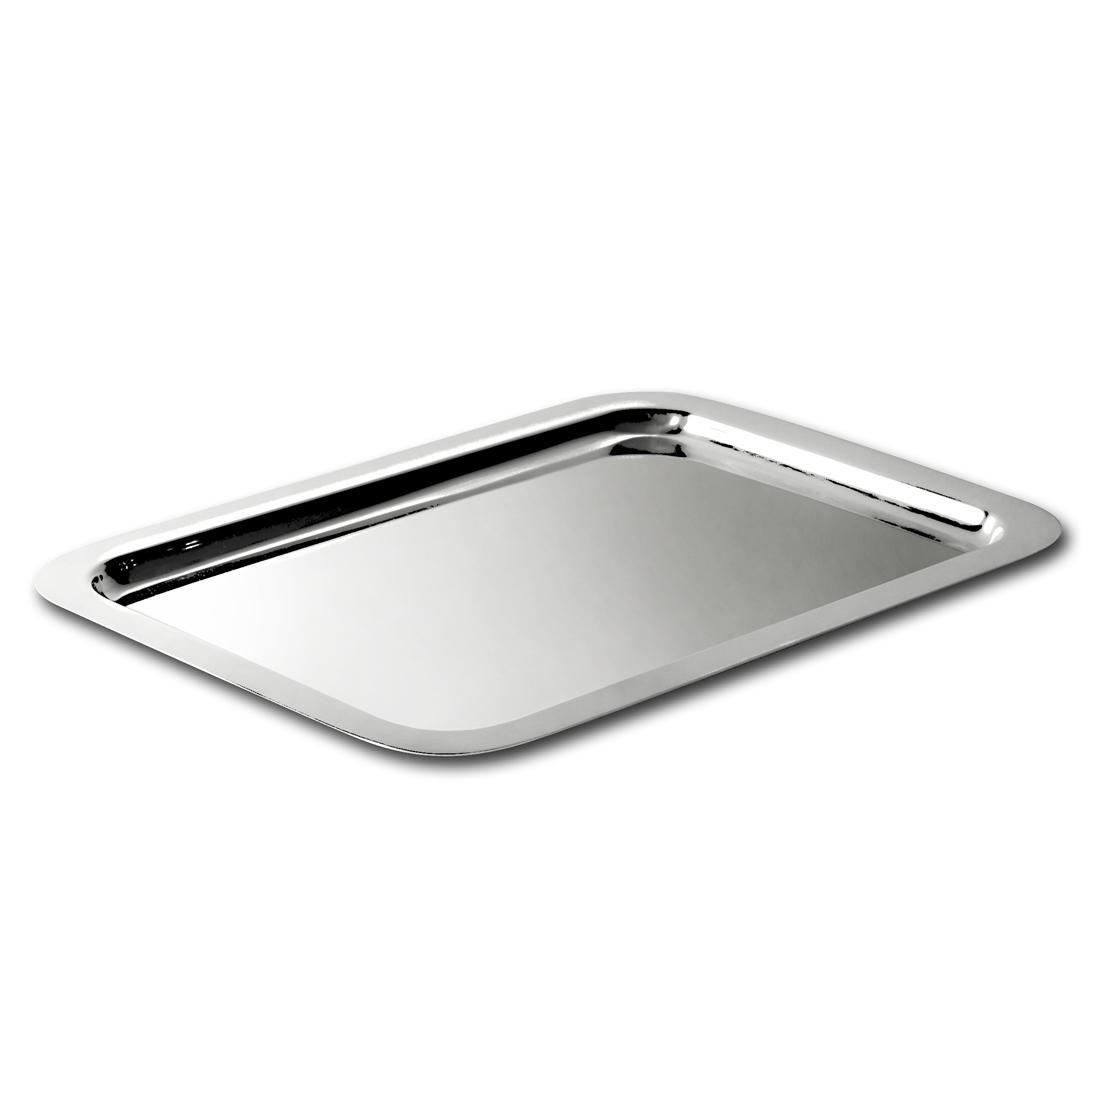 12-inch Rectangular Tray